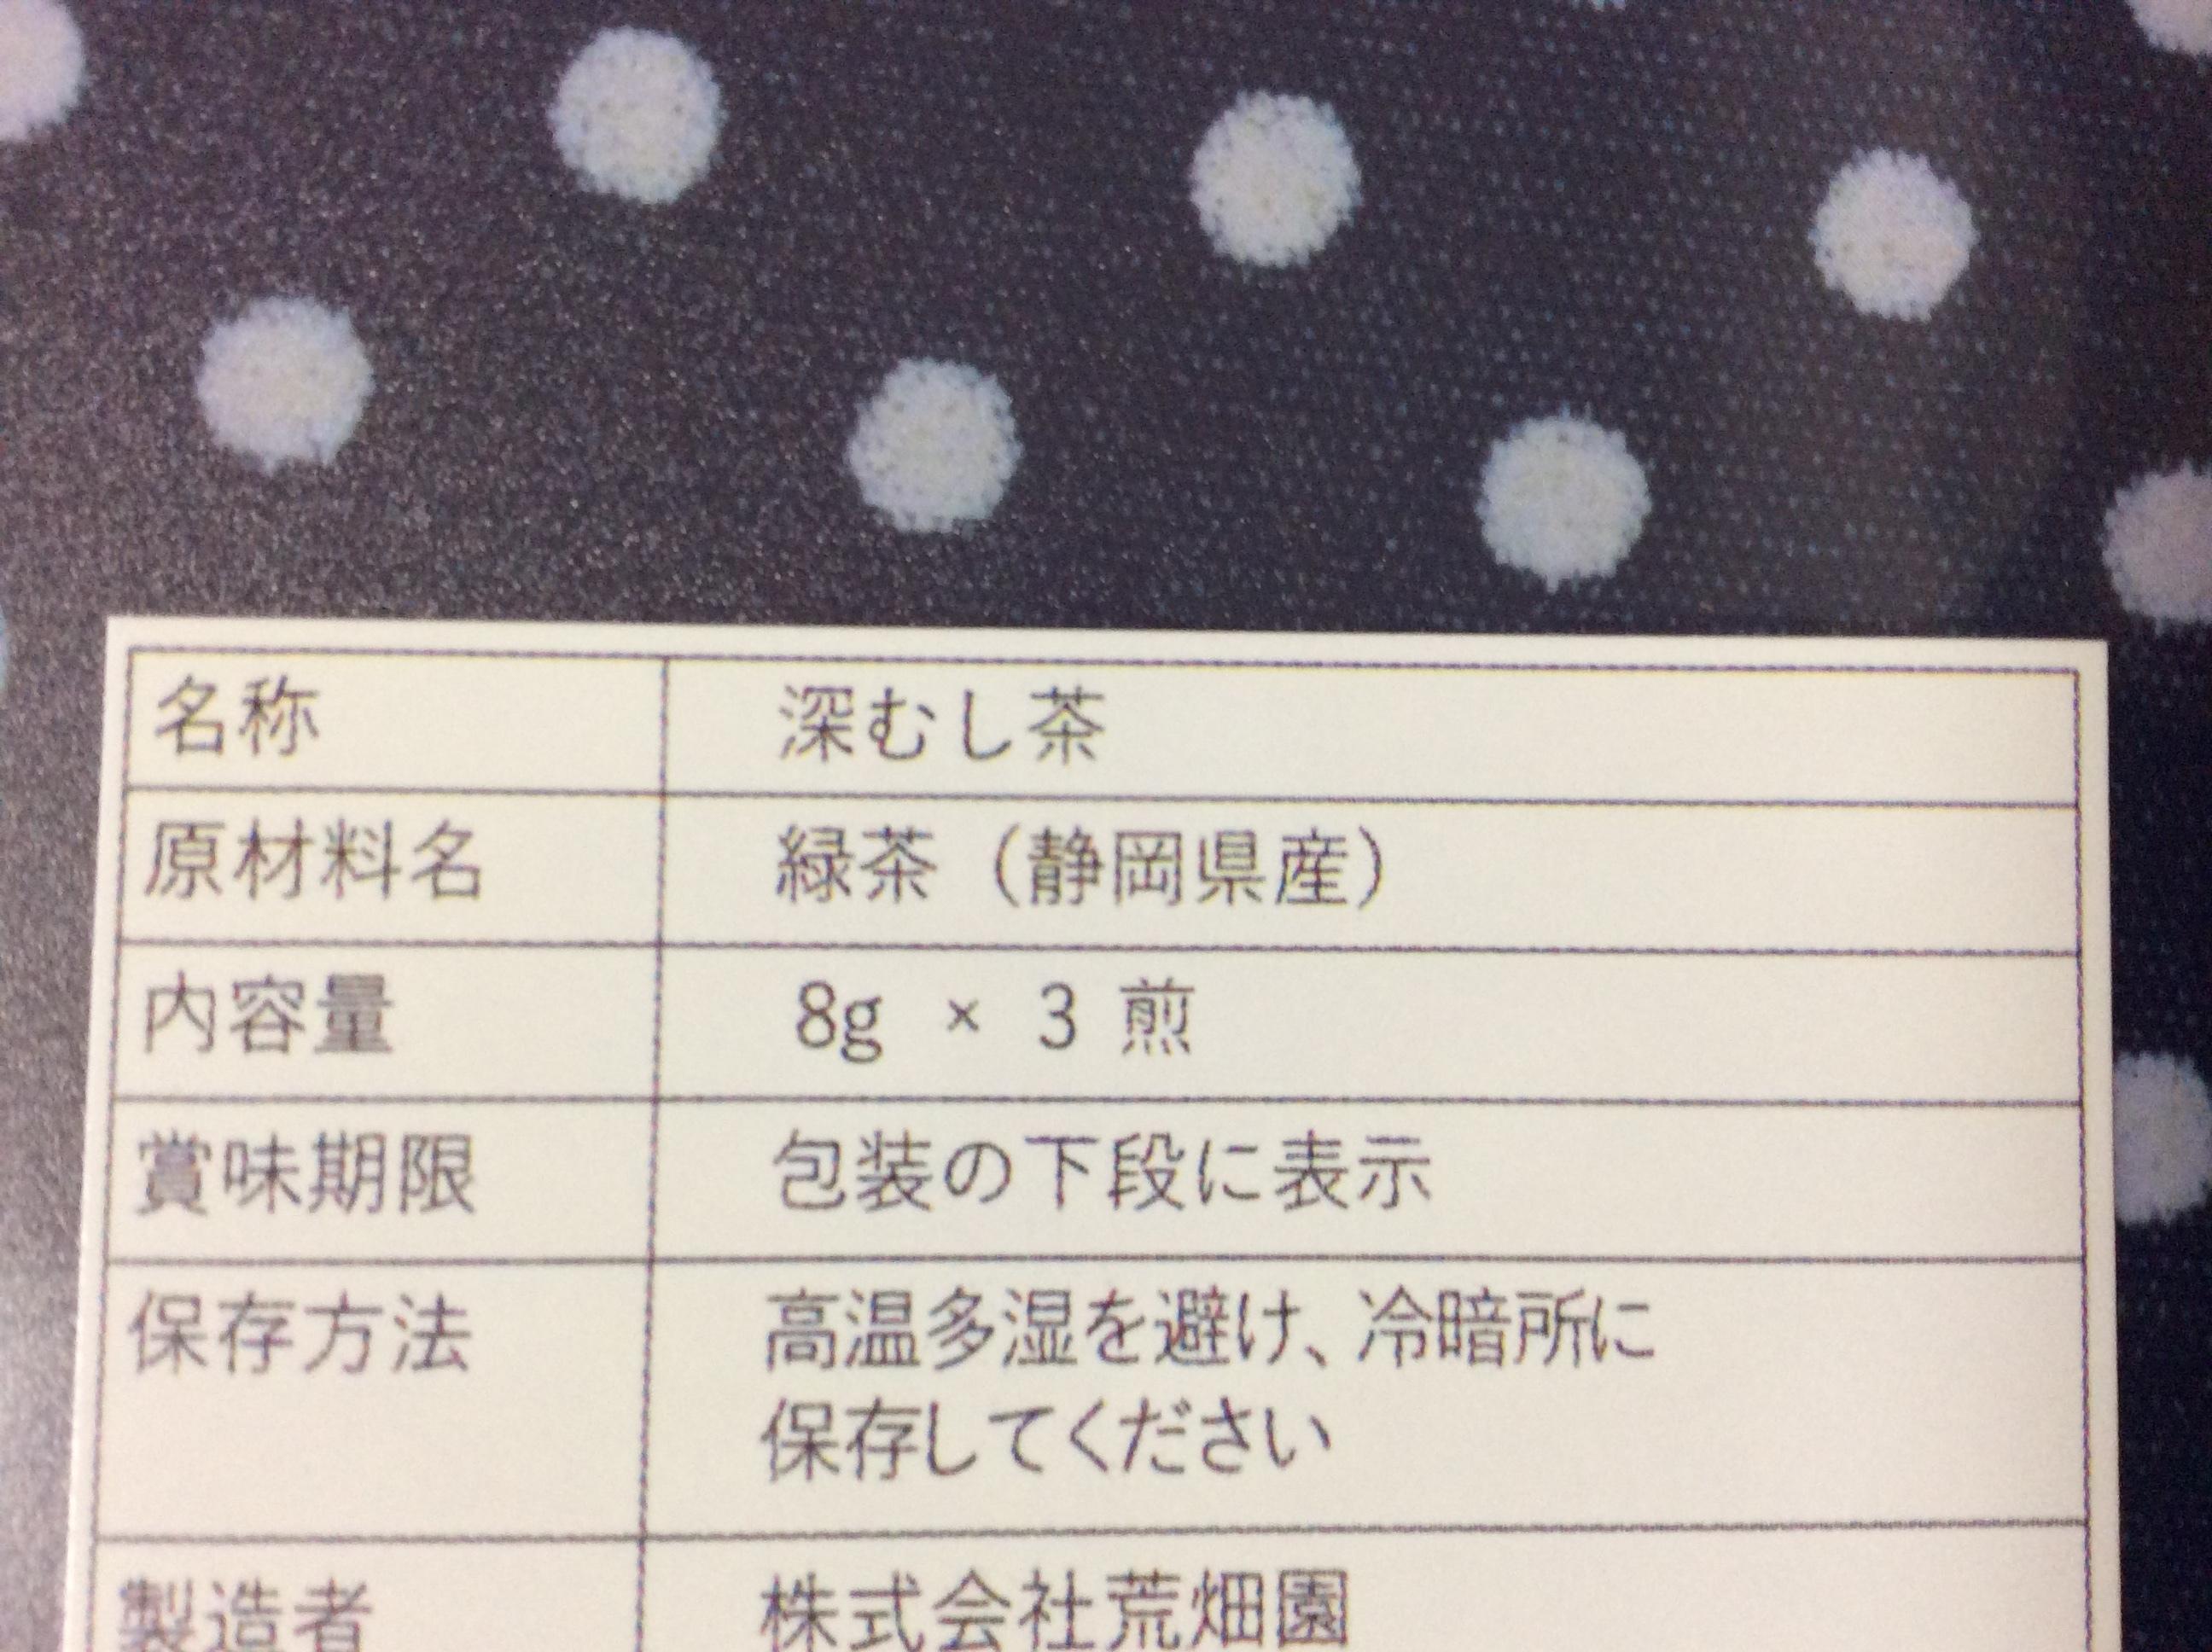 5398EAF5-360D-4AE1-9D86-C7E32A344968.jpeg